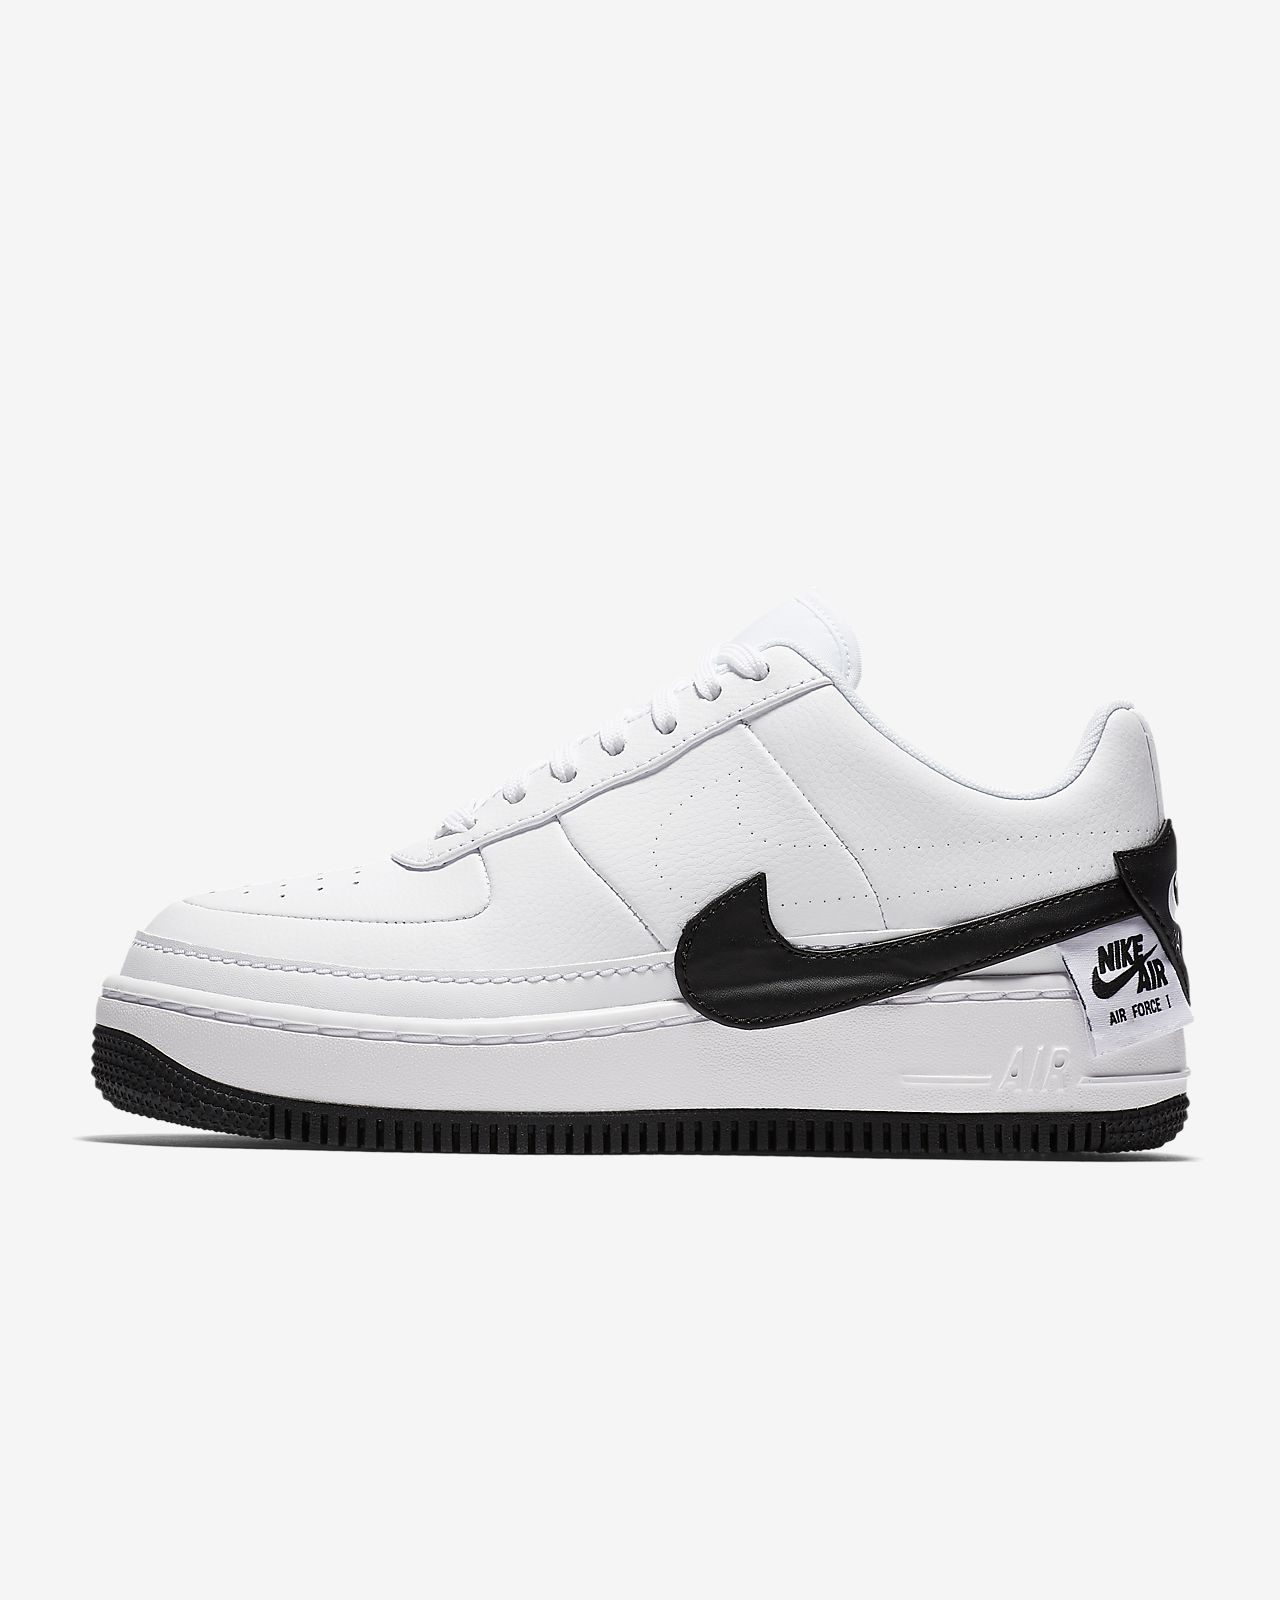 a57d23b39ee Calzado Nike Air Force 1 Jester XX. Nike.com MX